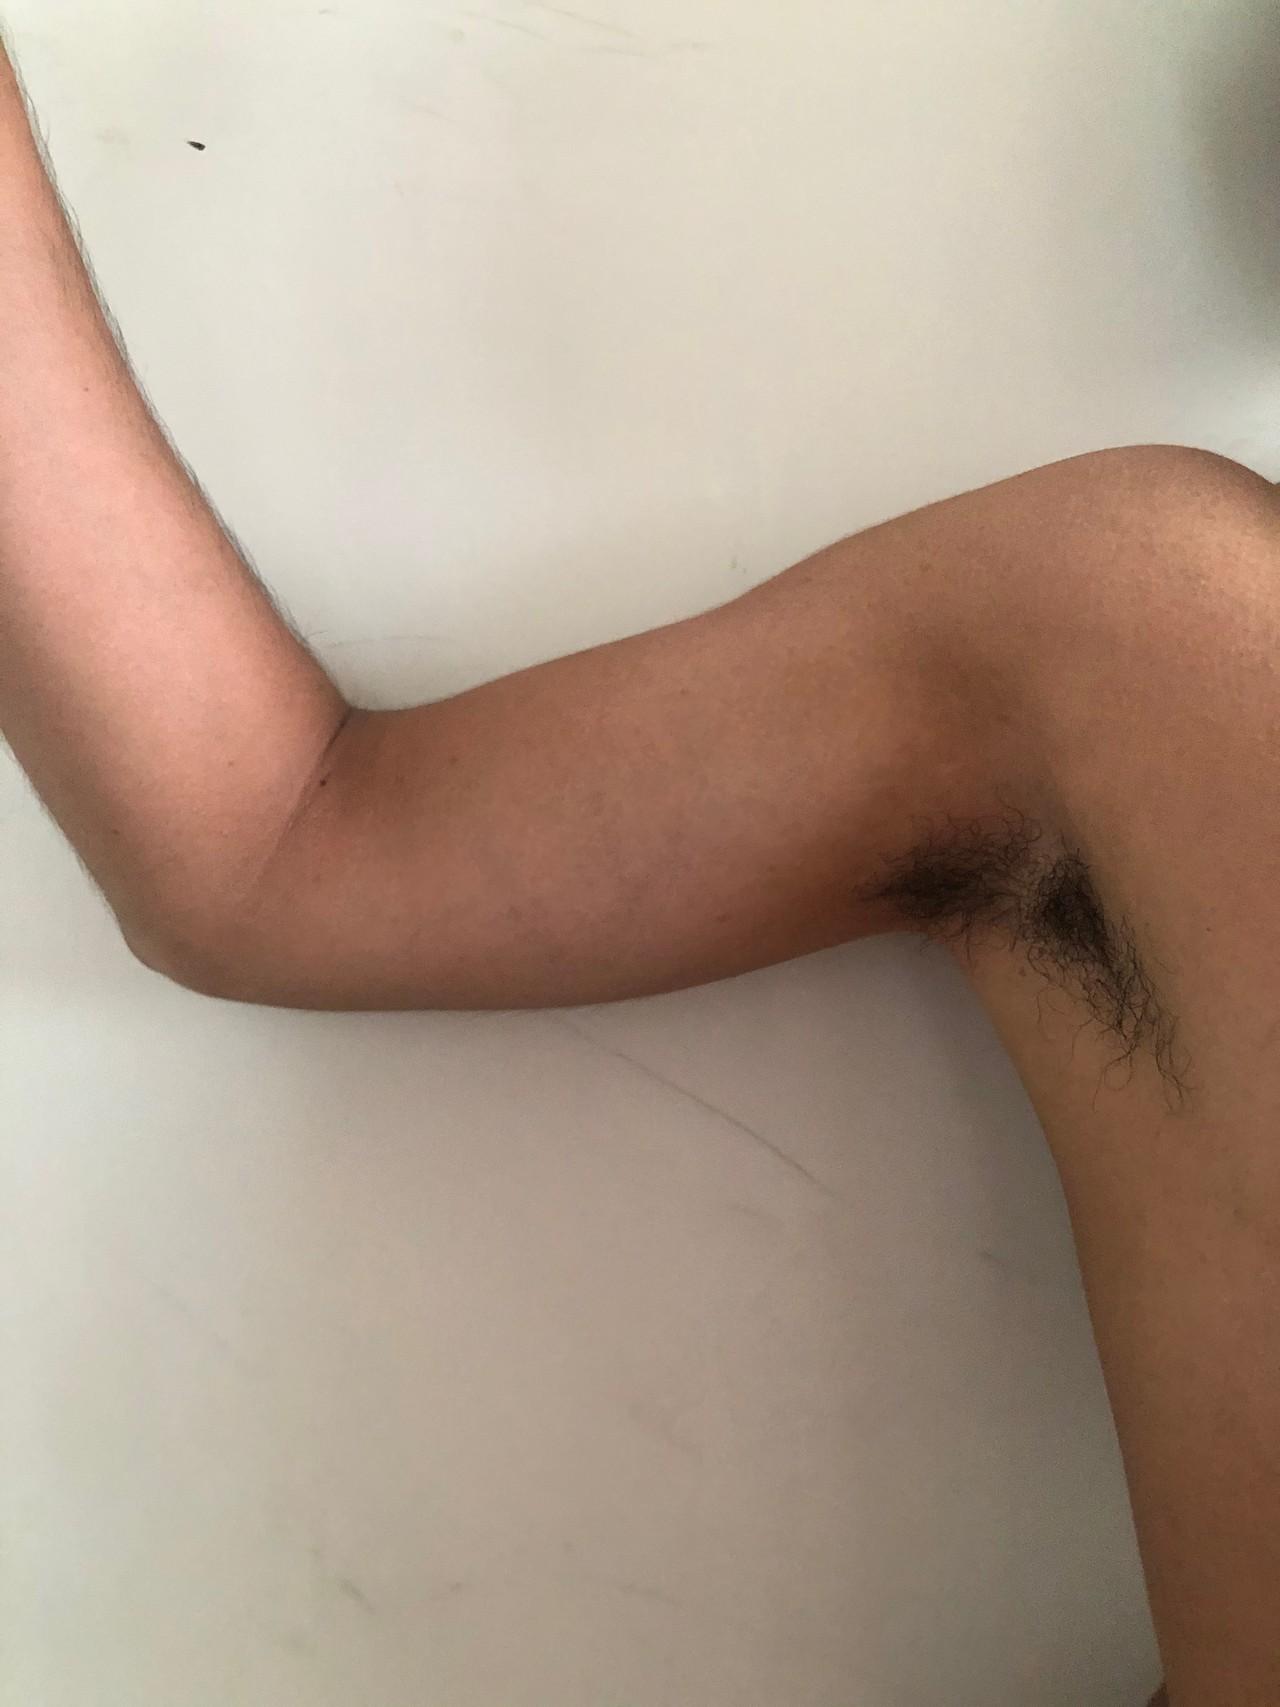 implante-biceps-2